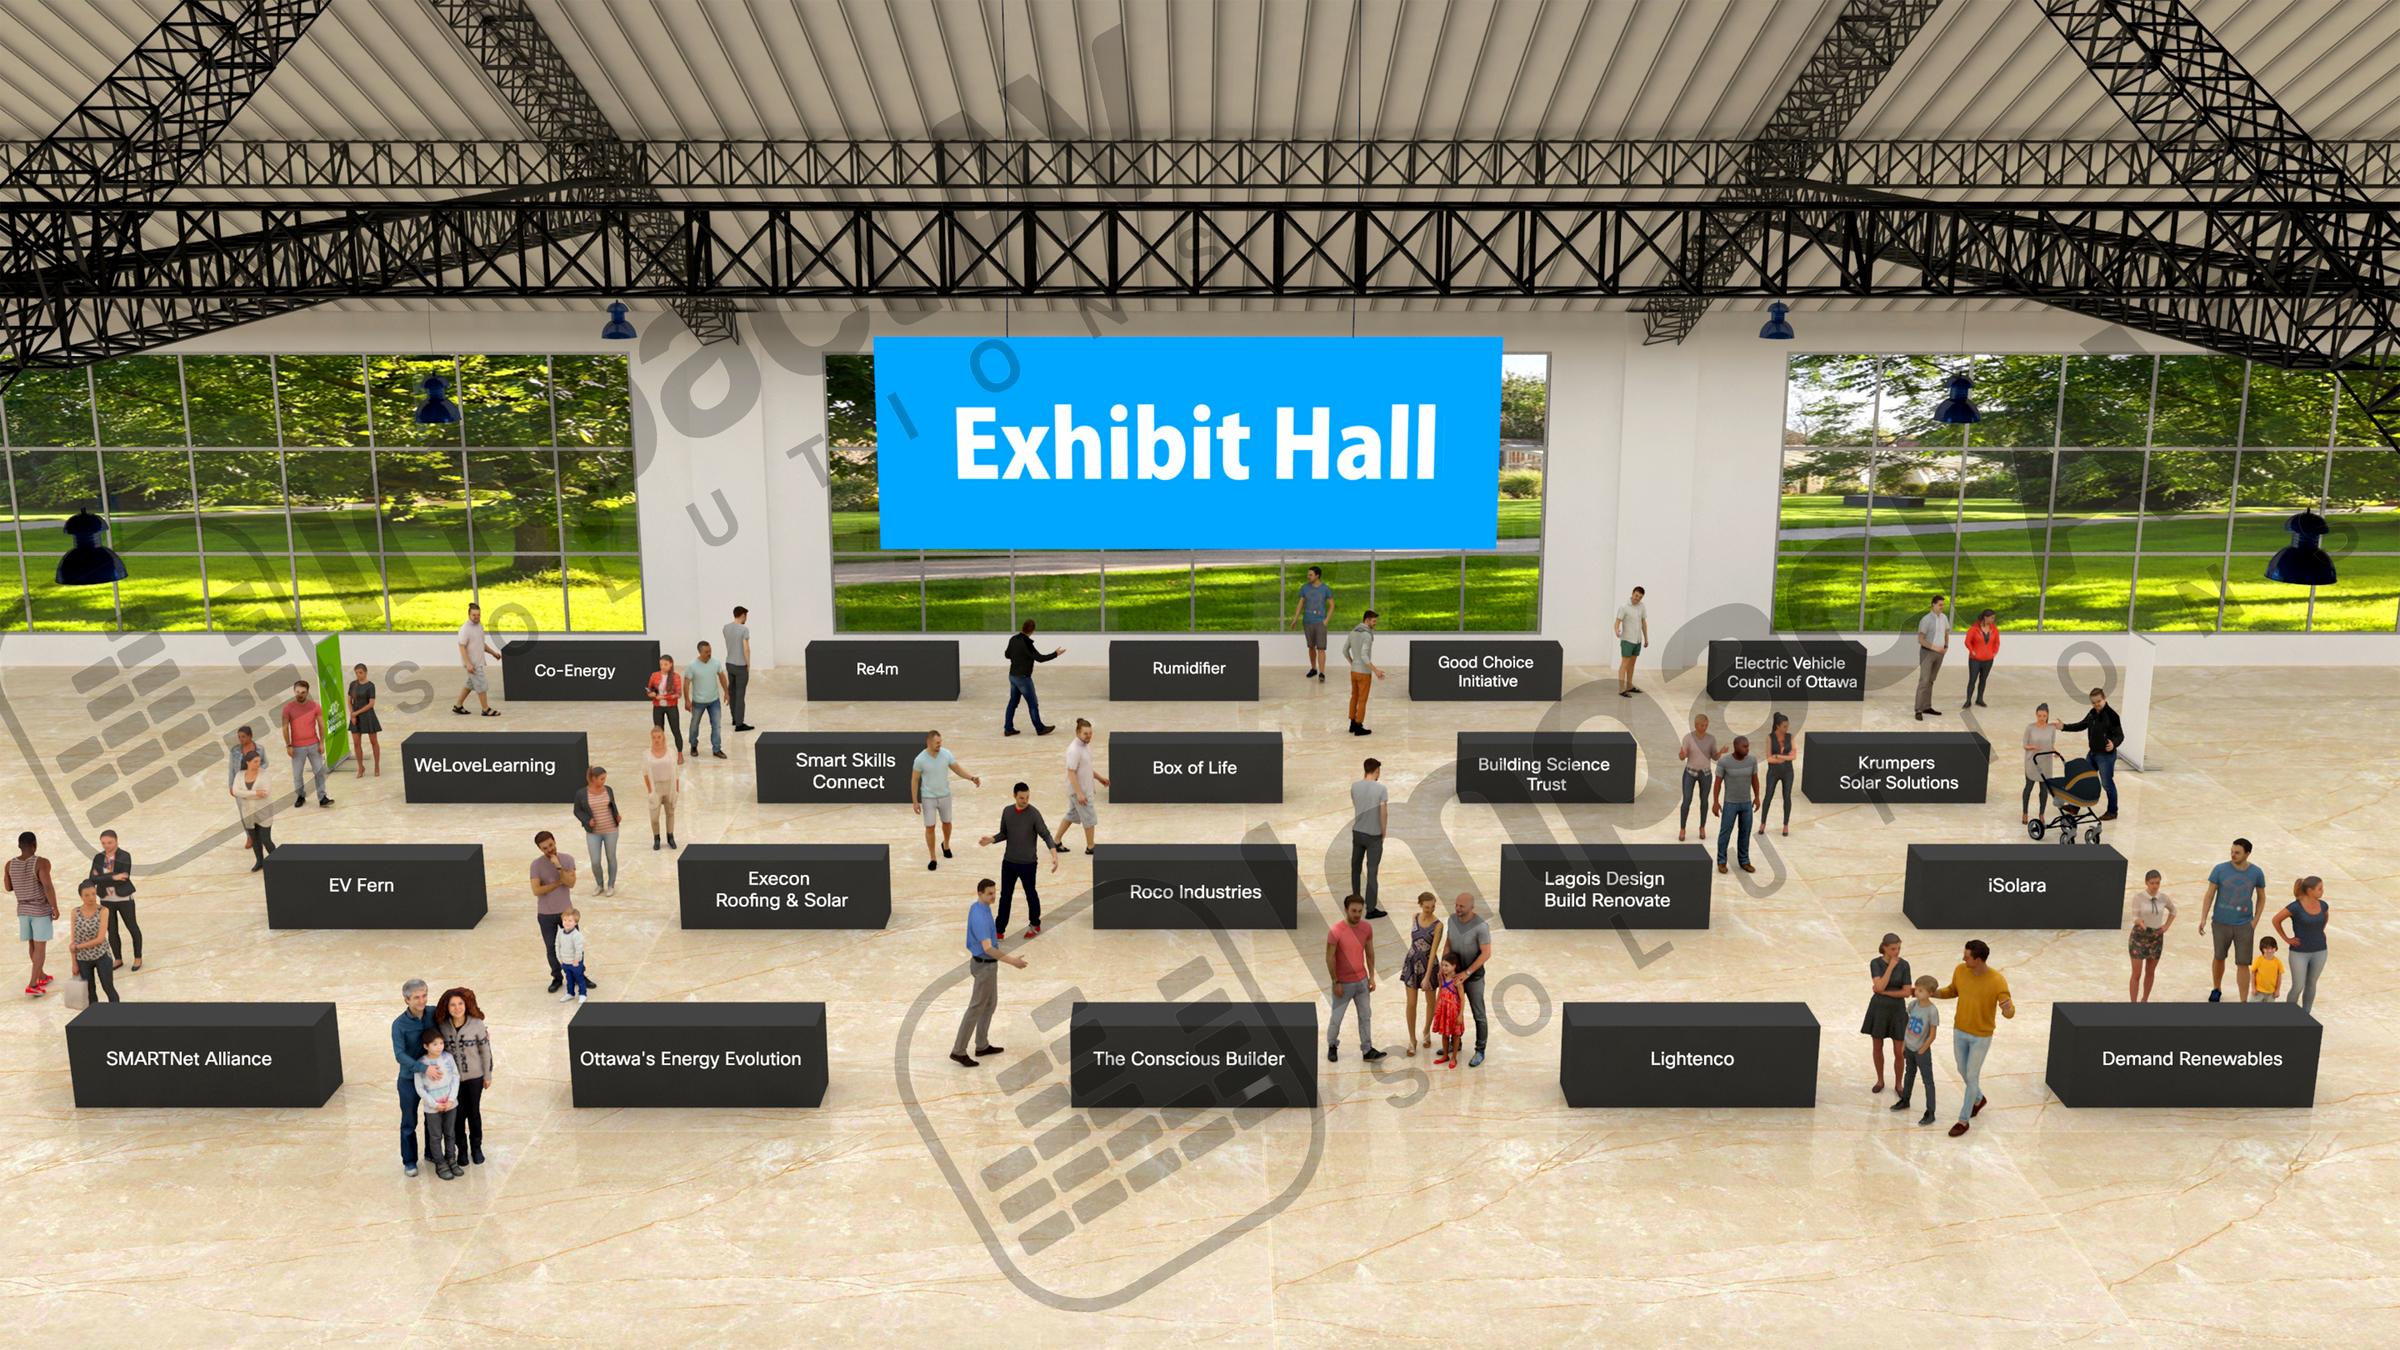 SNA Exhibition Hall